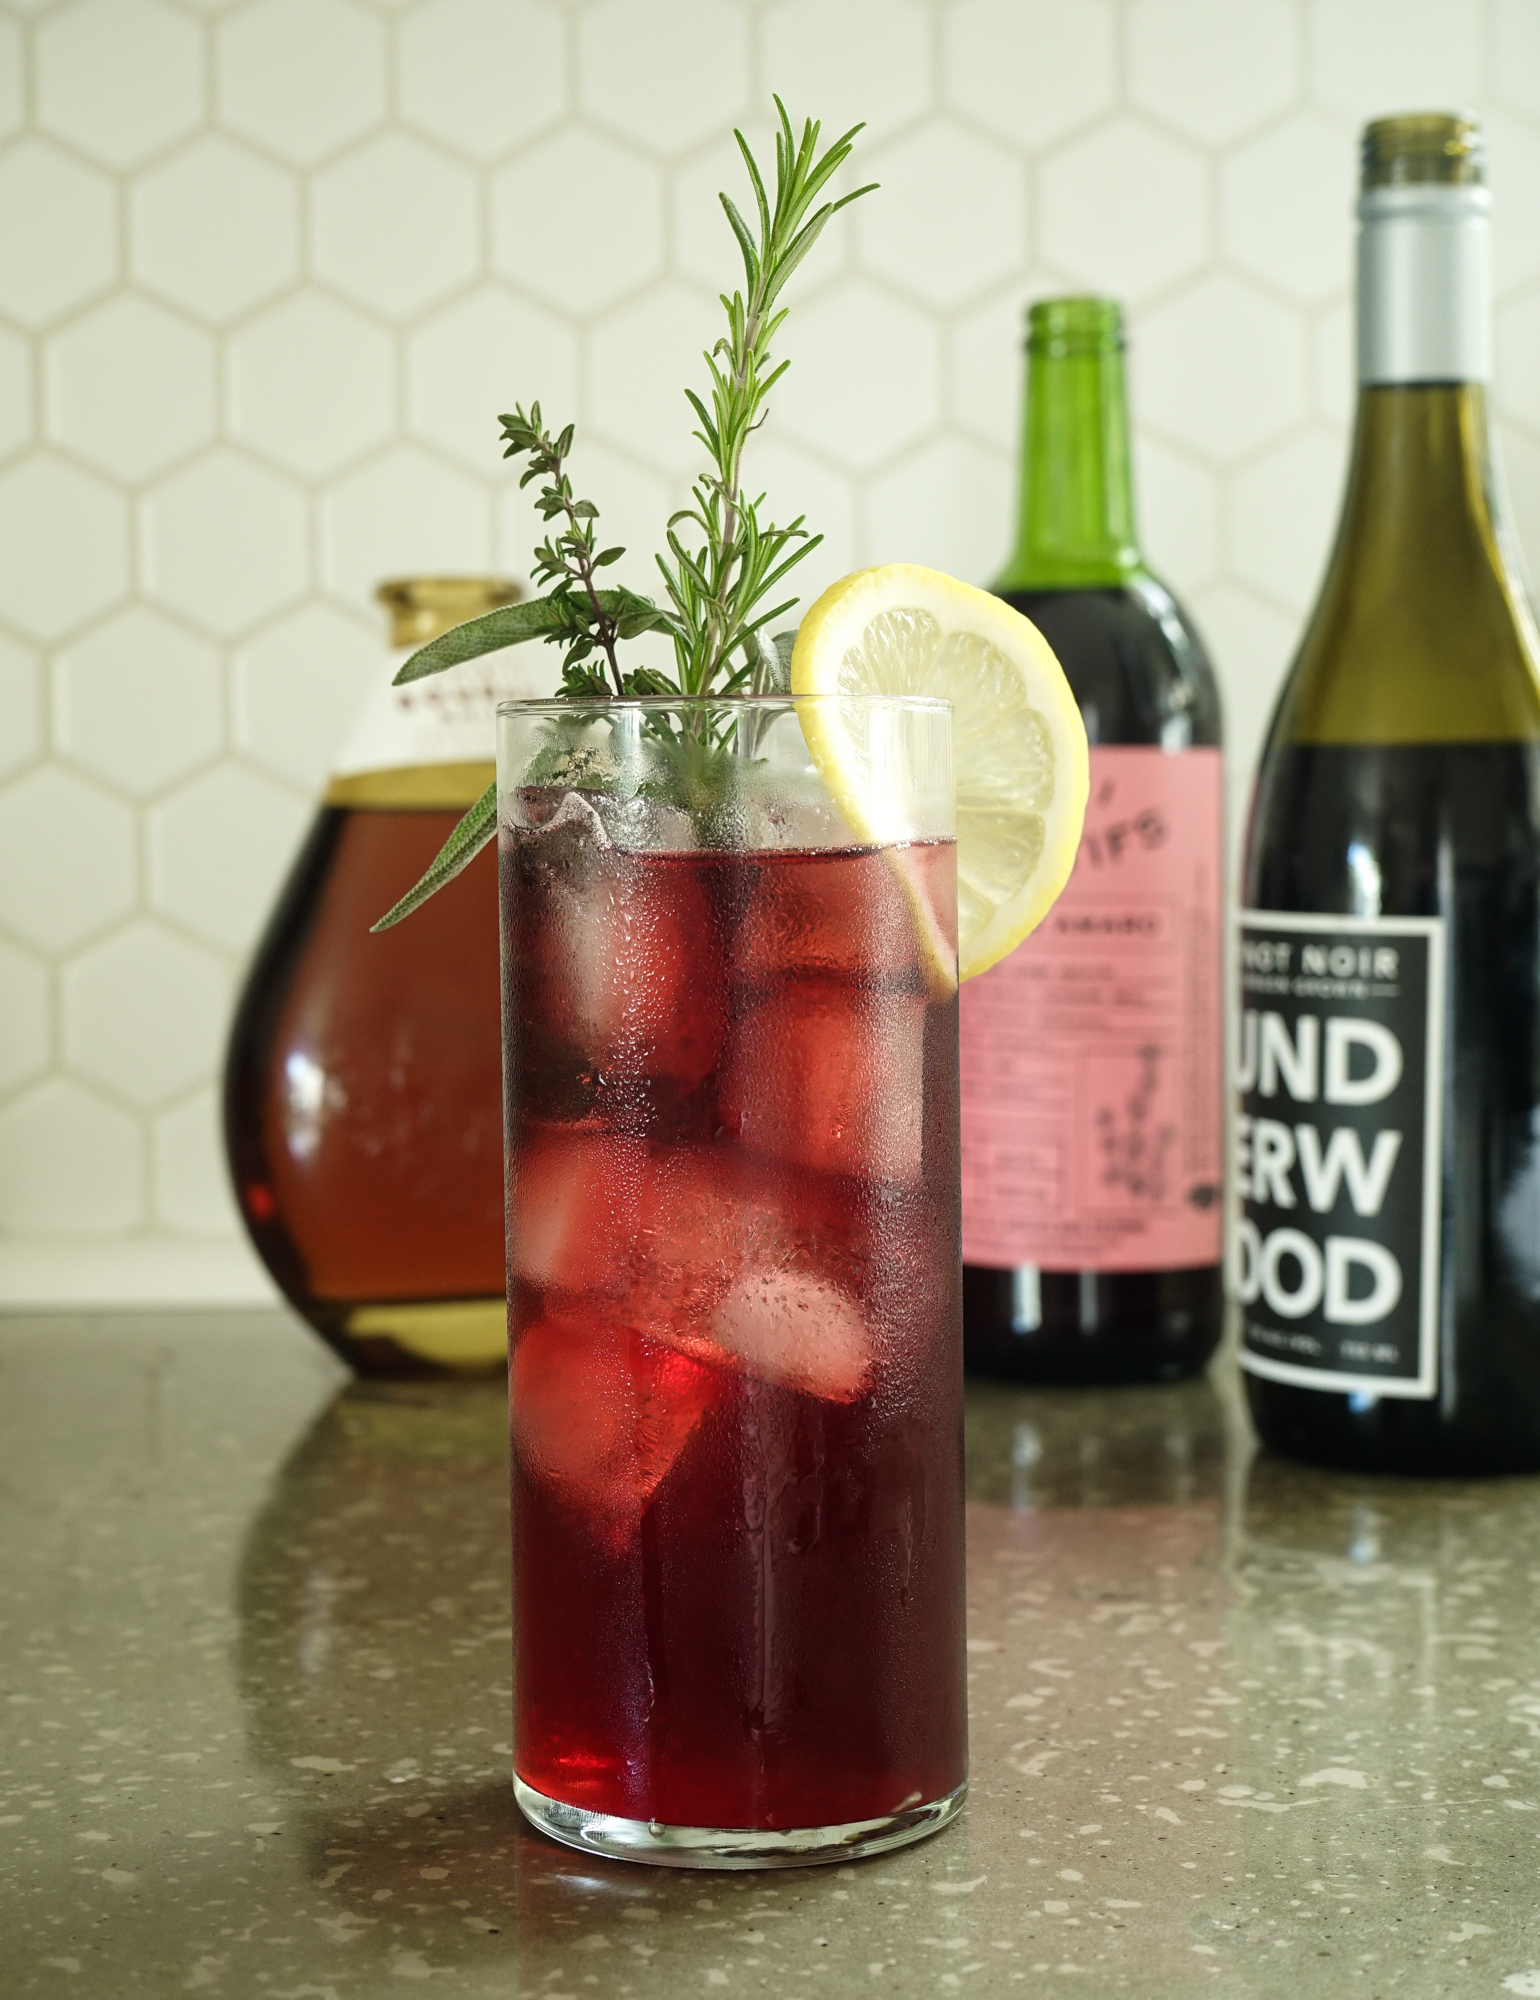 Underwood Pinot Noir Cocktail